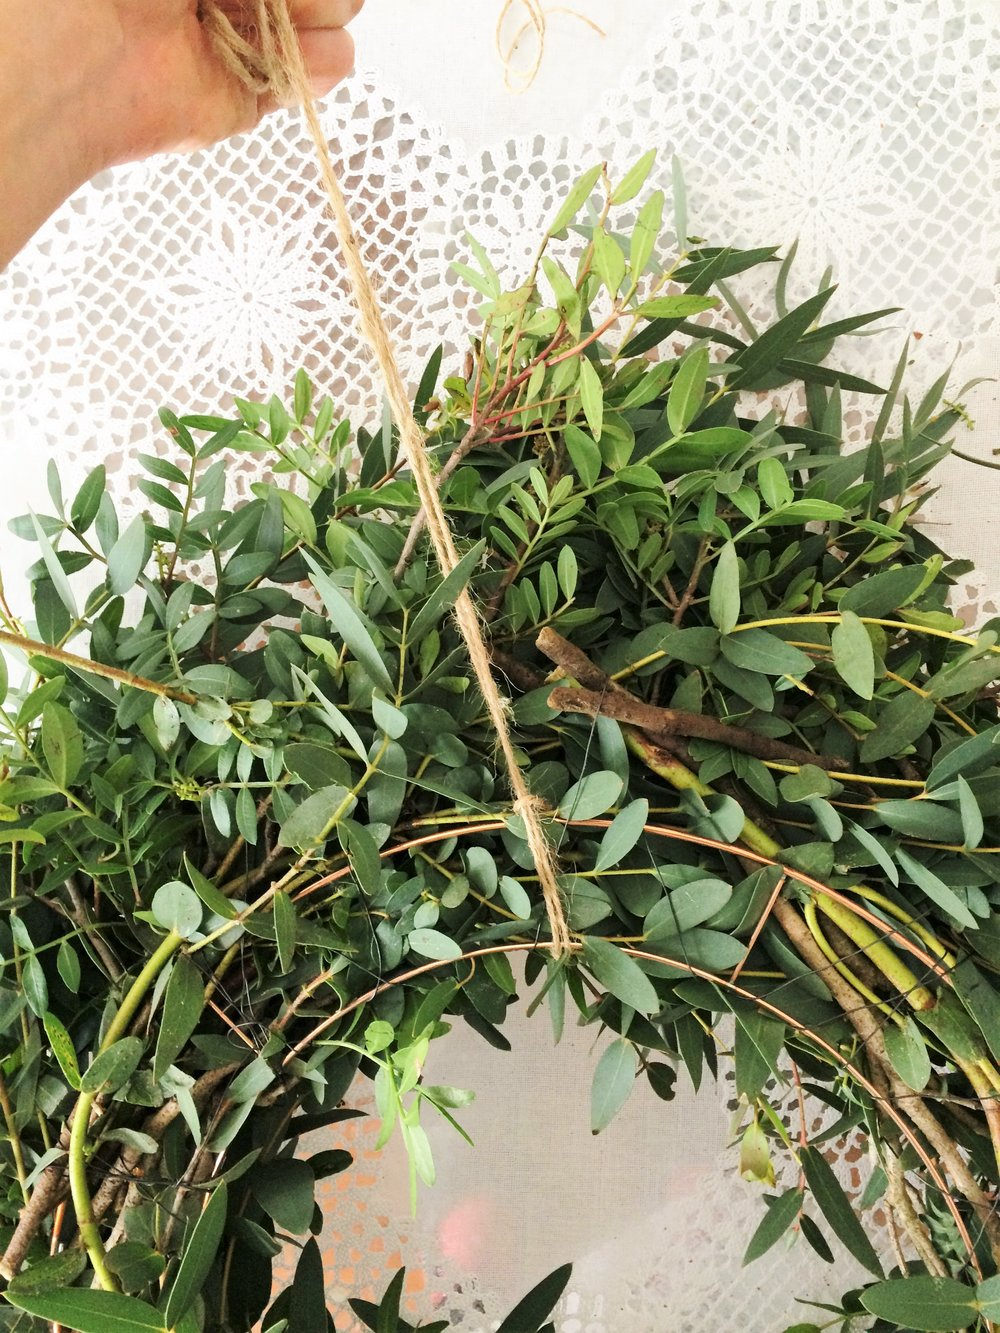 Webb-and-Farrer-Brighton-Florist-Sussex-Wedding-Flowers-How-to-make-a-foliage-wreath-DIY-tutorial (1).JPG